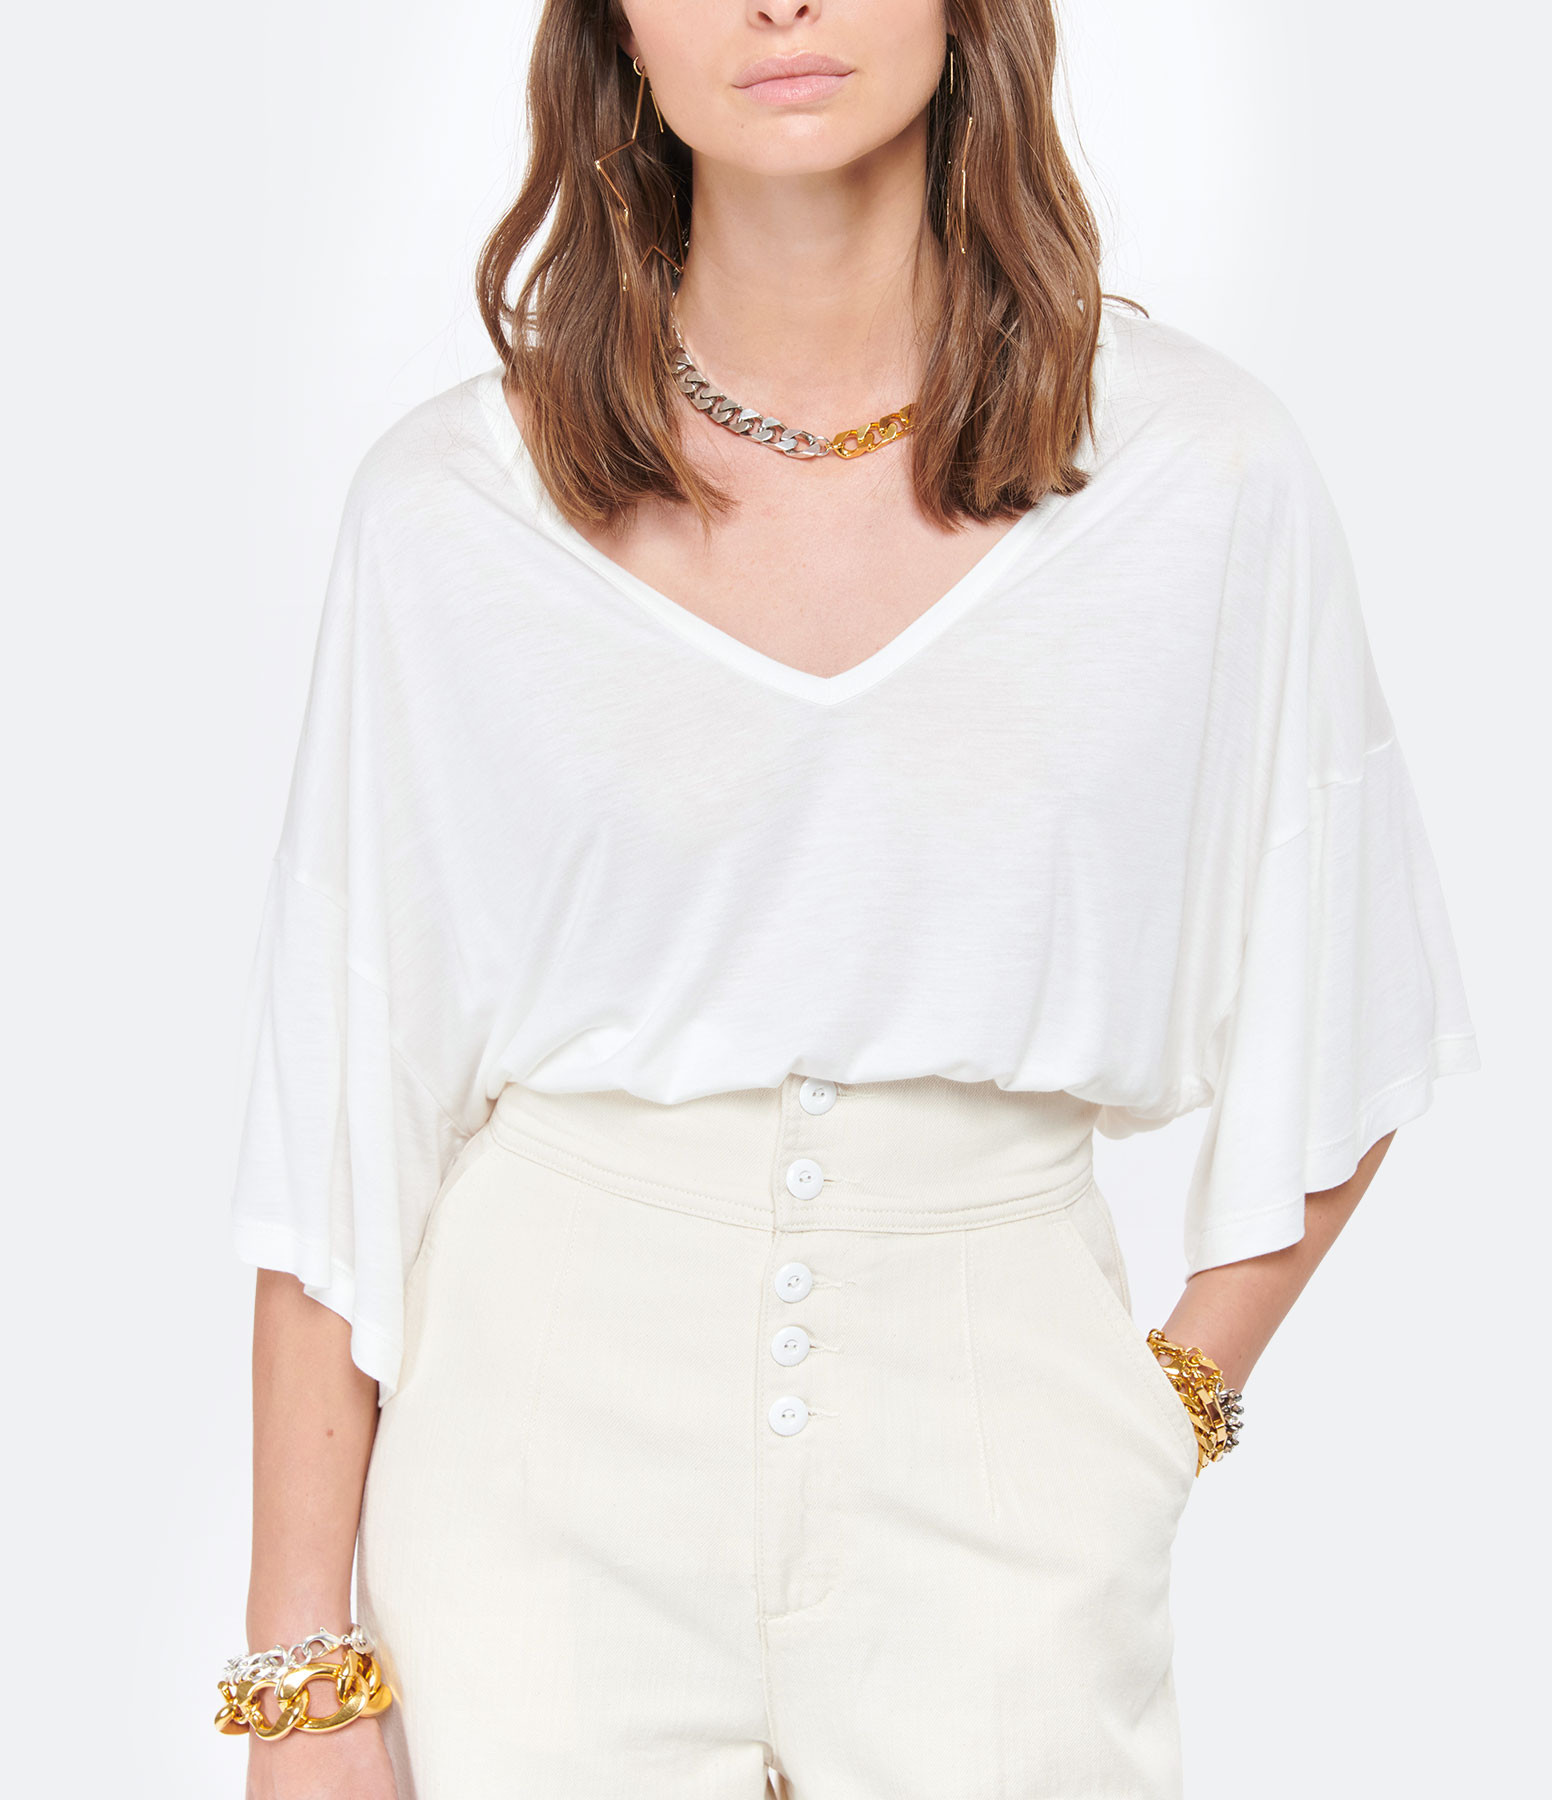 MAEVY - Tee-shirt Marie Bambou Beige